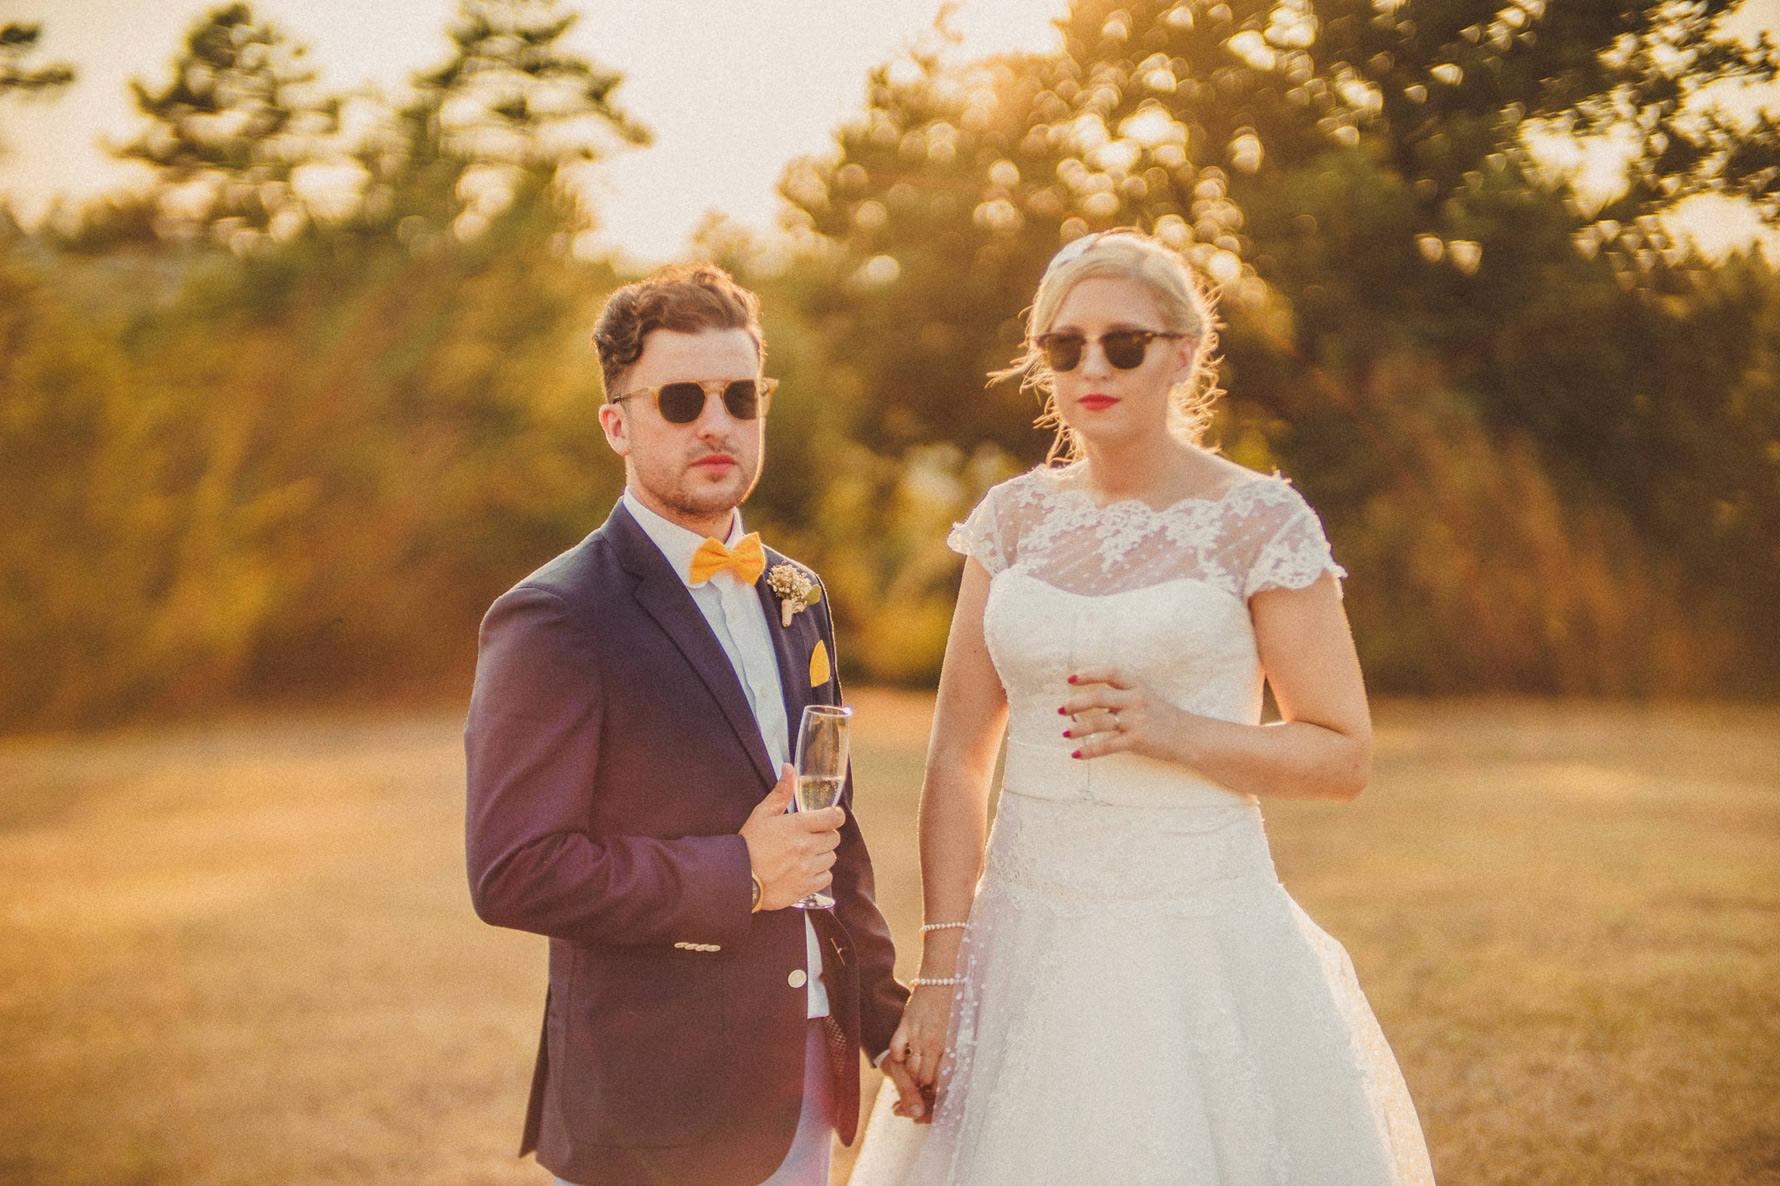 sunset-creative-portrait-bride-and-groom